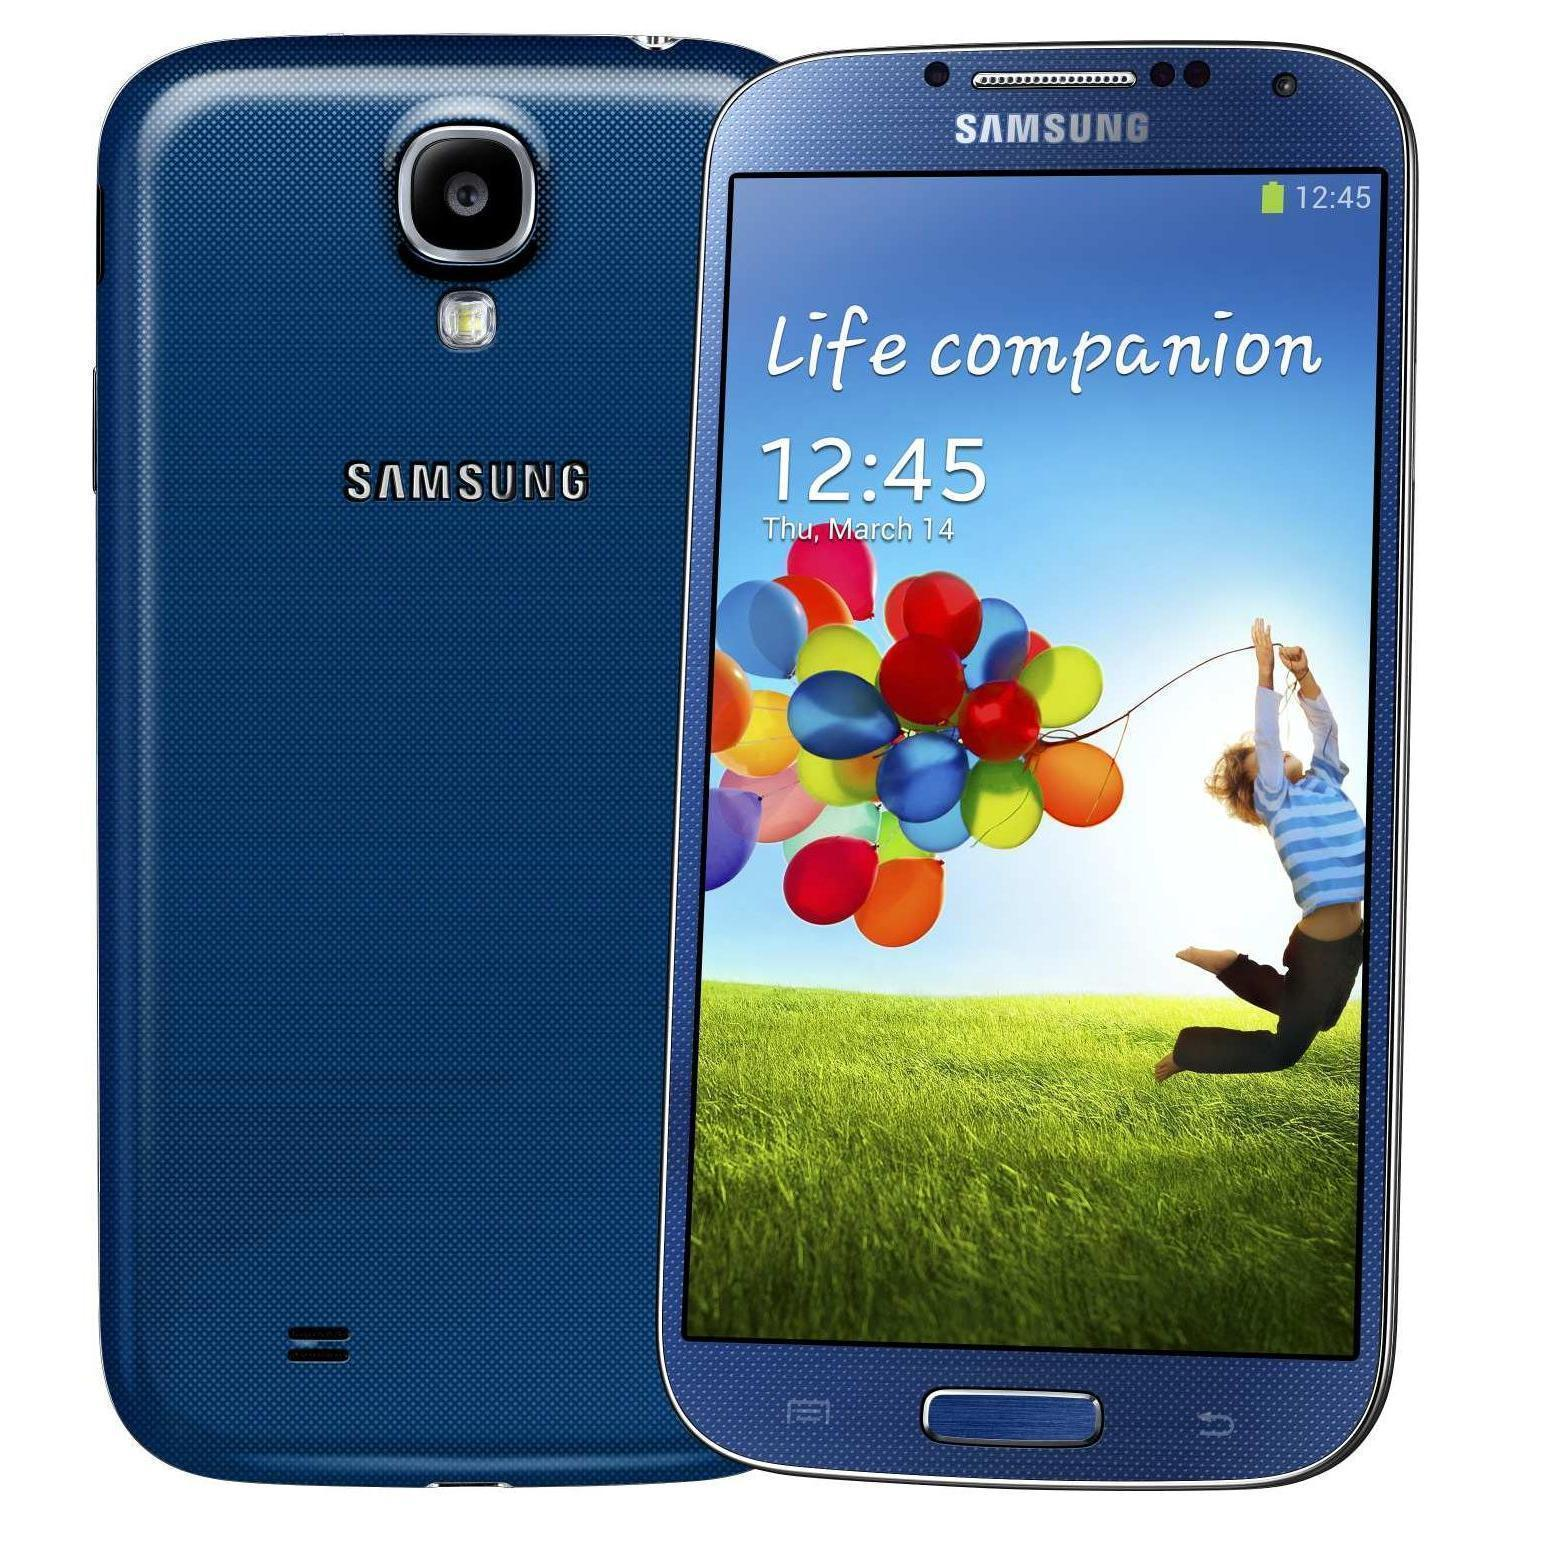 Samsung Galaxy S4 16 Go - Bleu - Débloqué